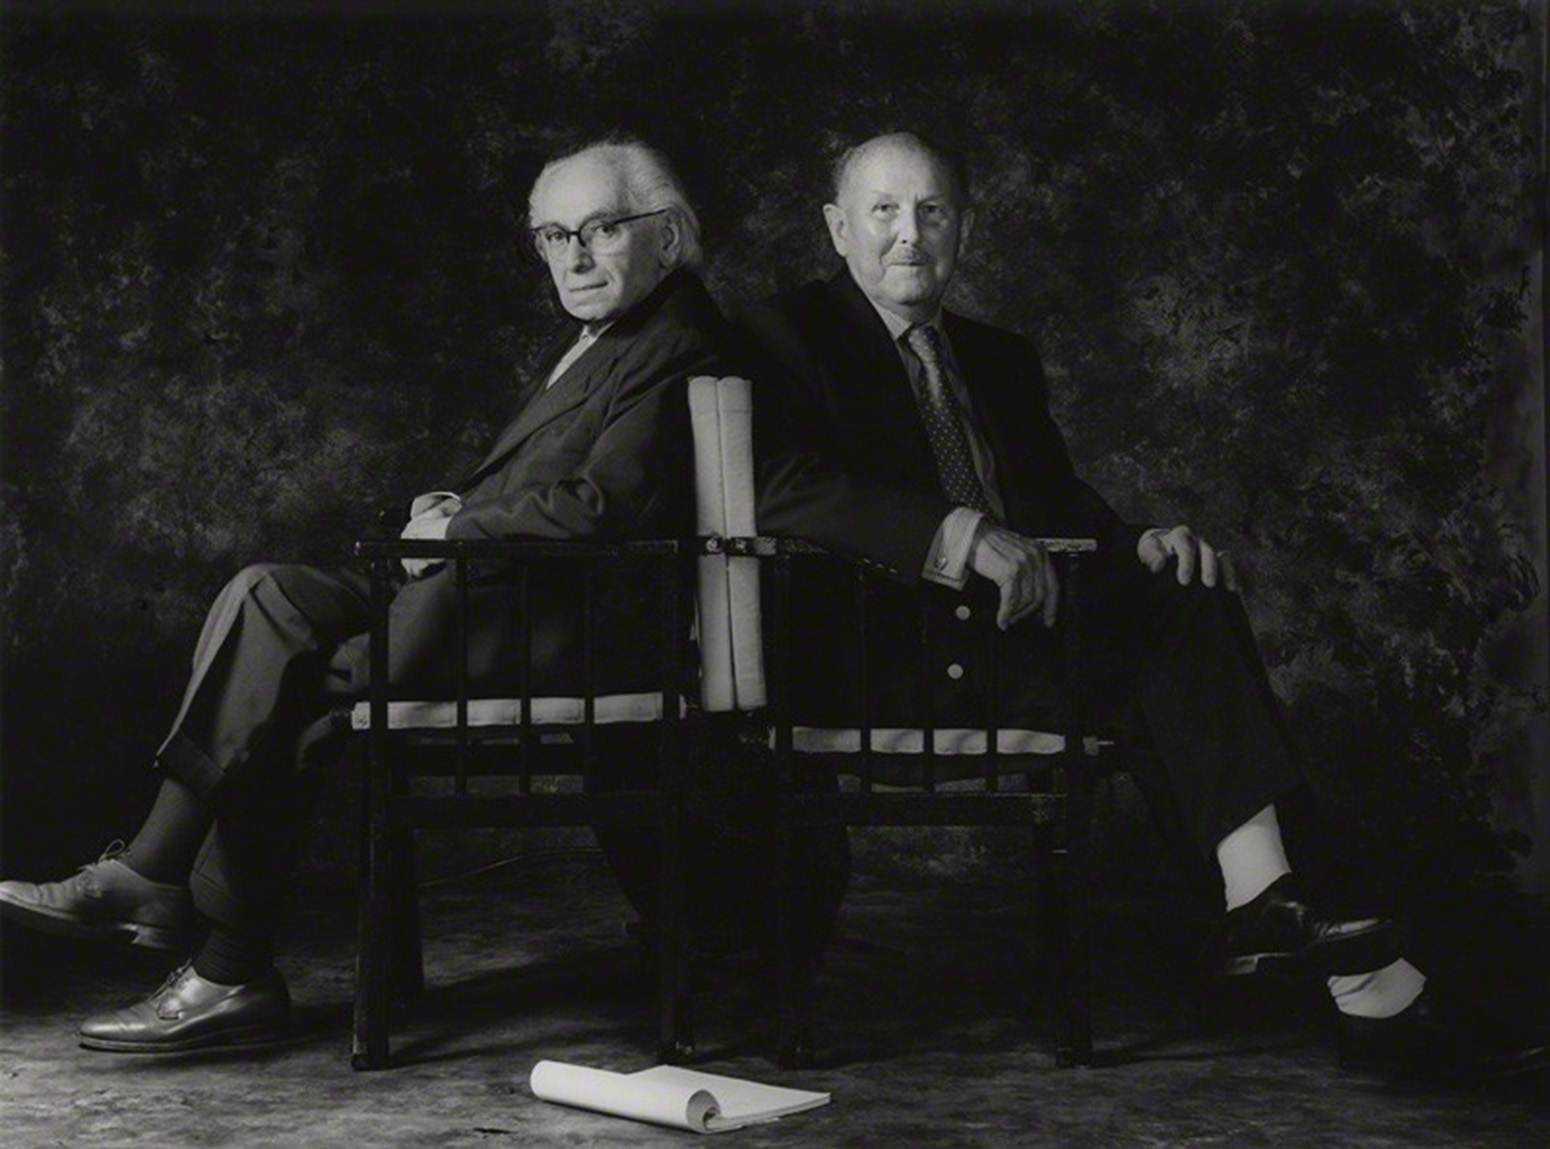 Pressburger (left) and Powell in 1985. (Credit: Cornel Lucas)